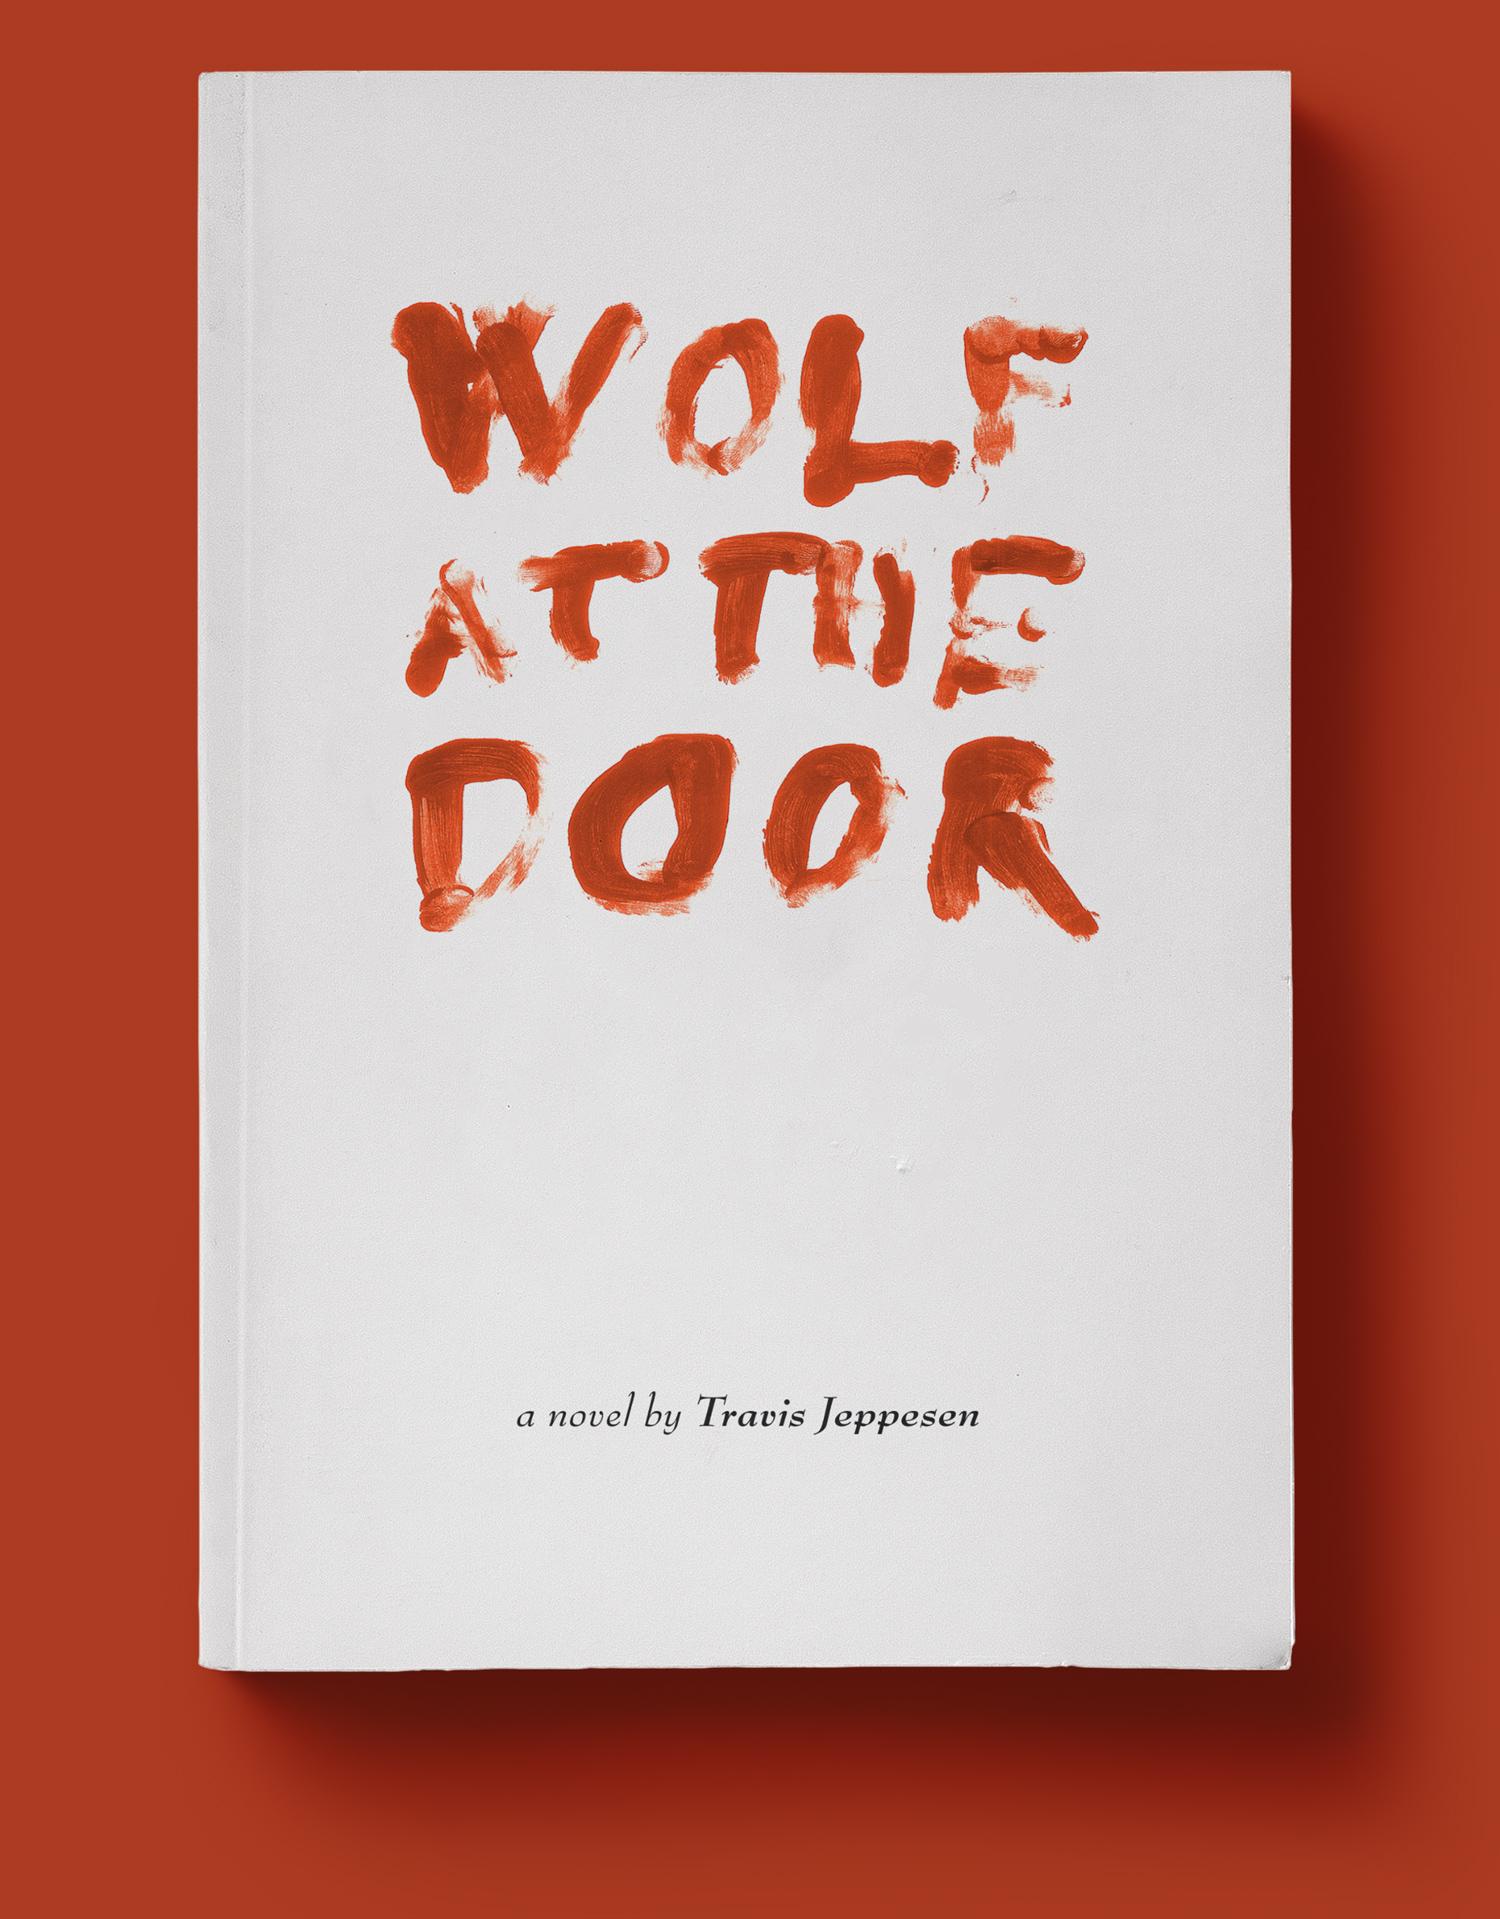 Mario Dzurila Book Cover Design Travis Jeppesen Wolf At The Door